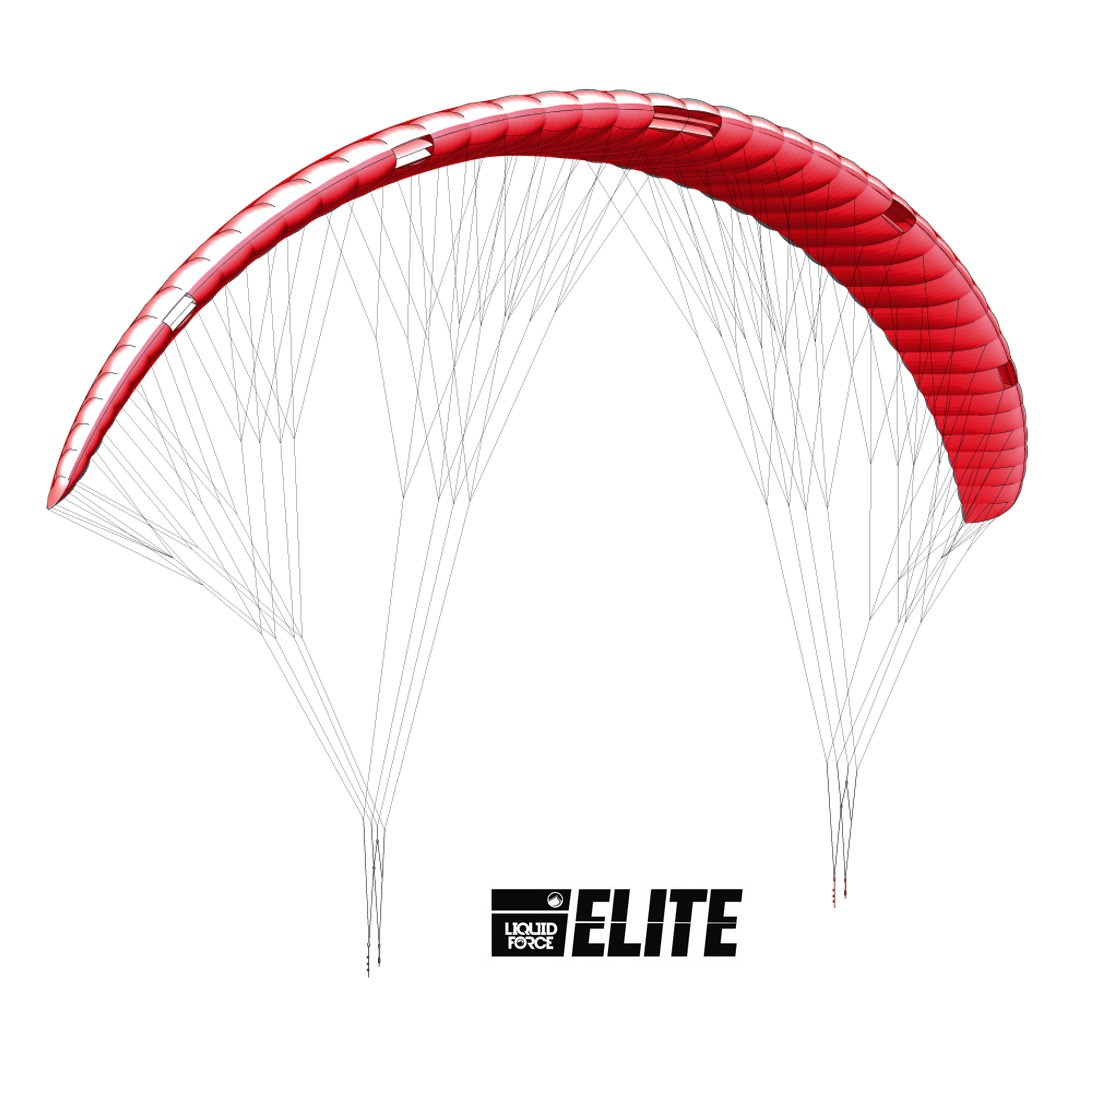 2016 Liquid Force Elite Foil kite